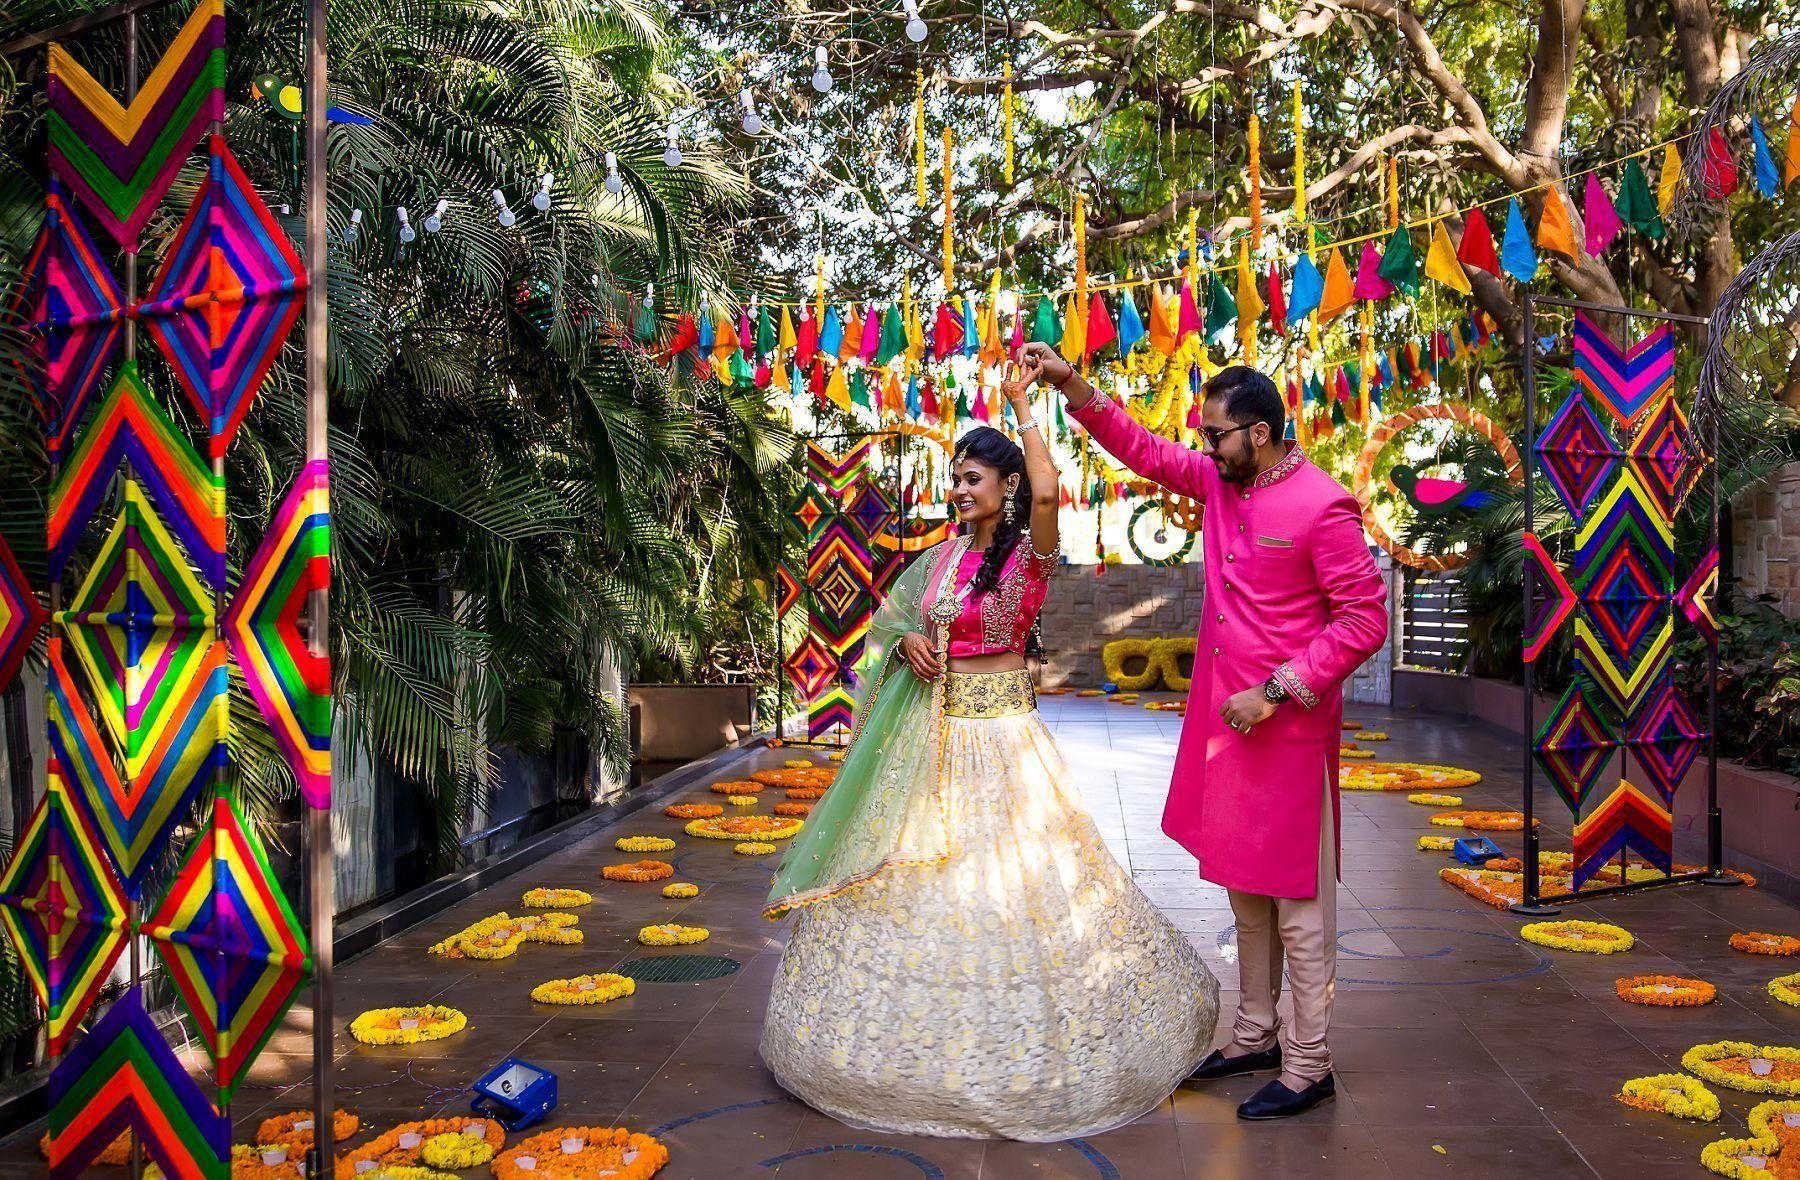 Mela theme colorful mehndi sangeet wedding photography ahmedabad mela theme colorful mehndi sangeet wedding photography ahmedabad junglespirit Gallery